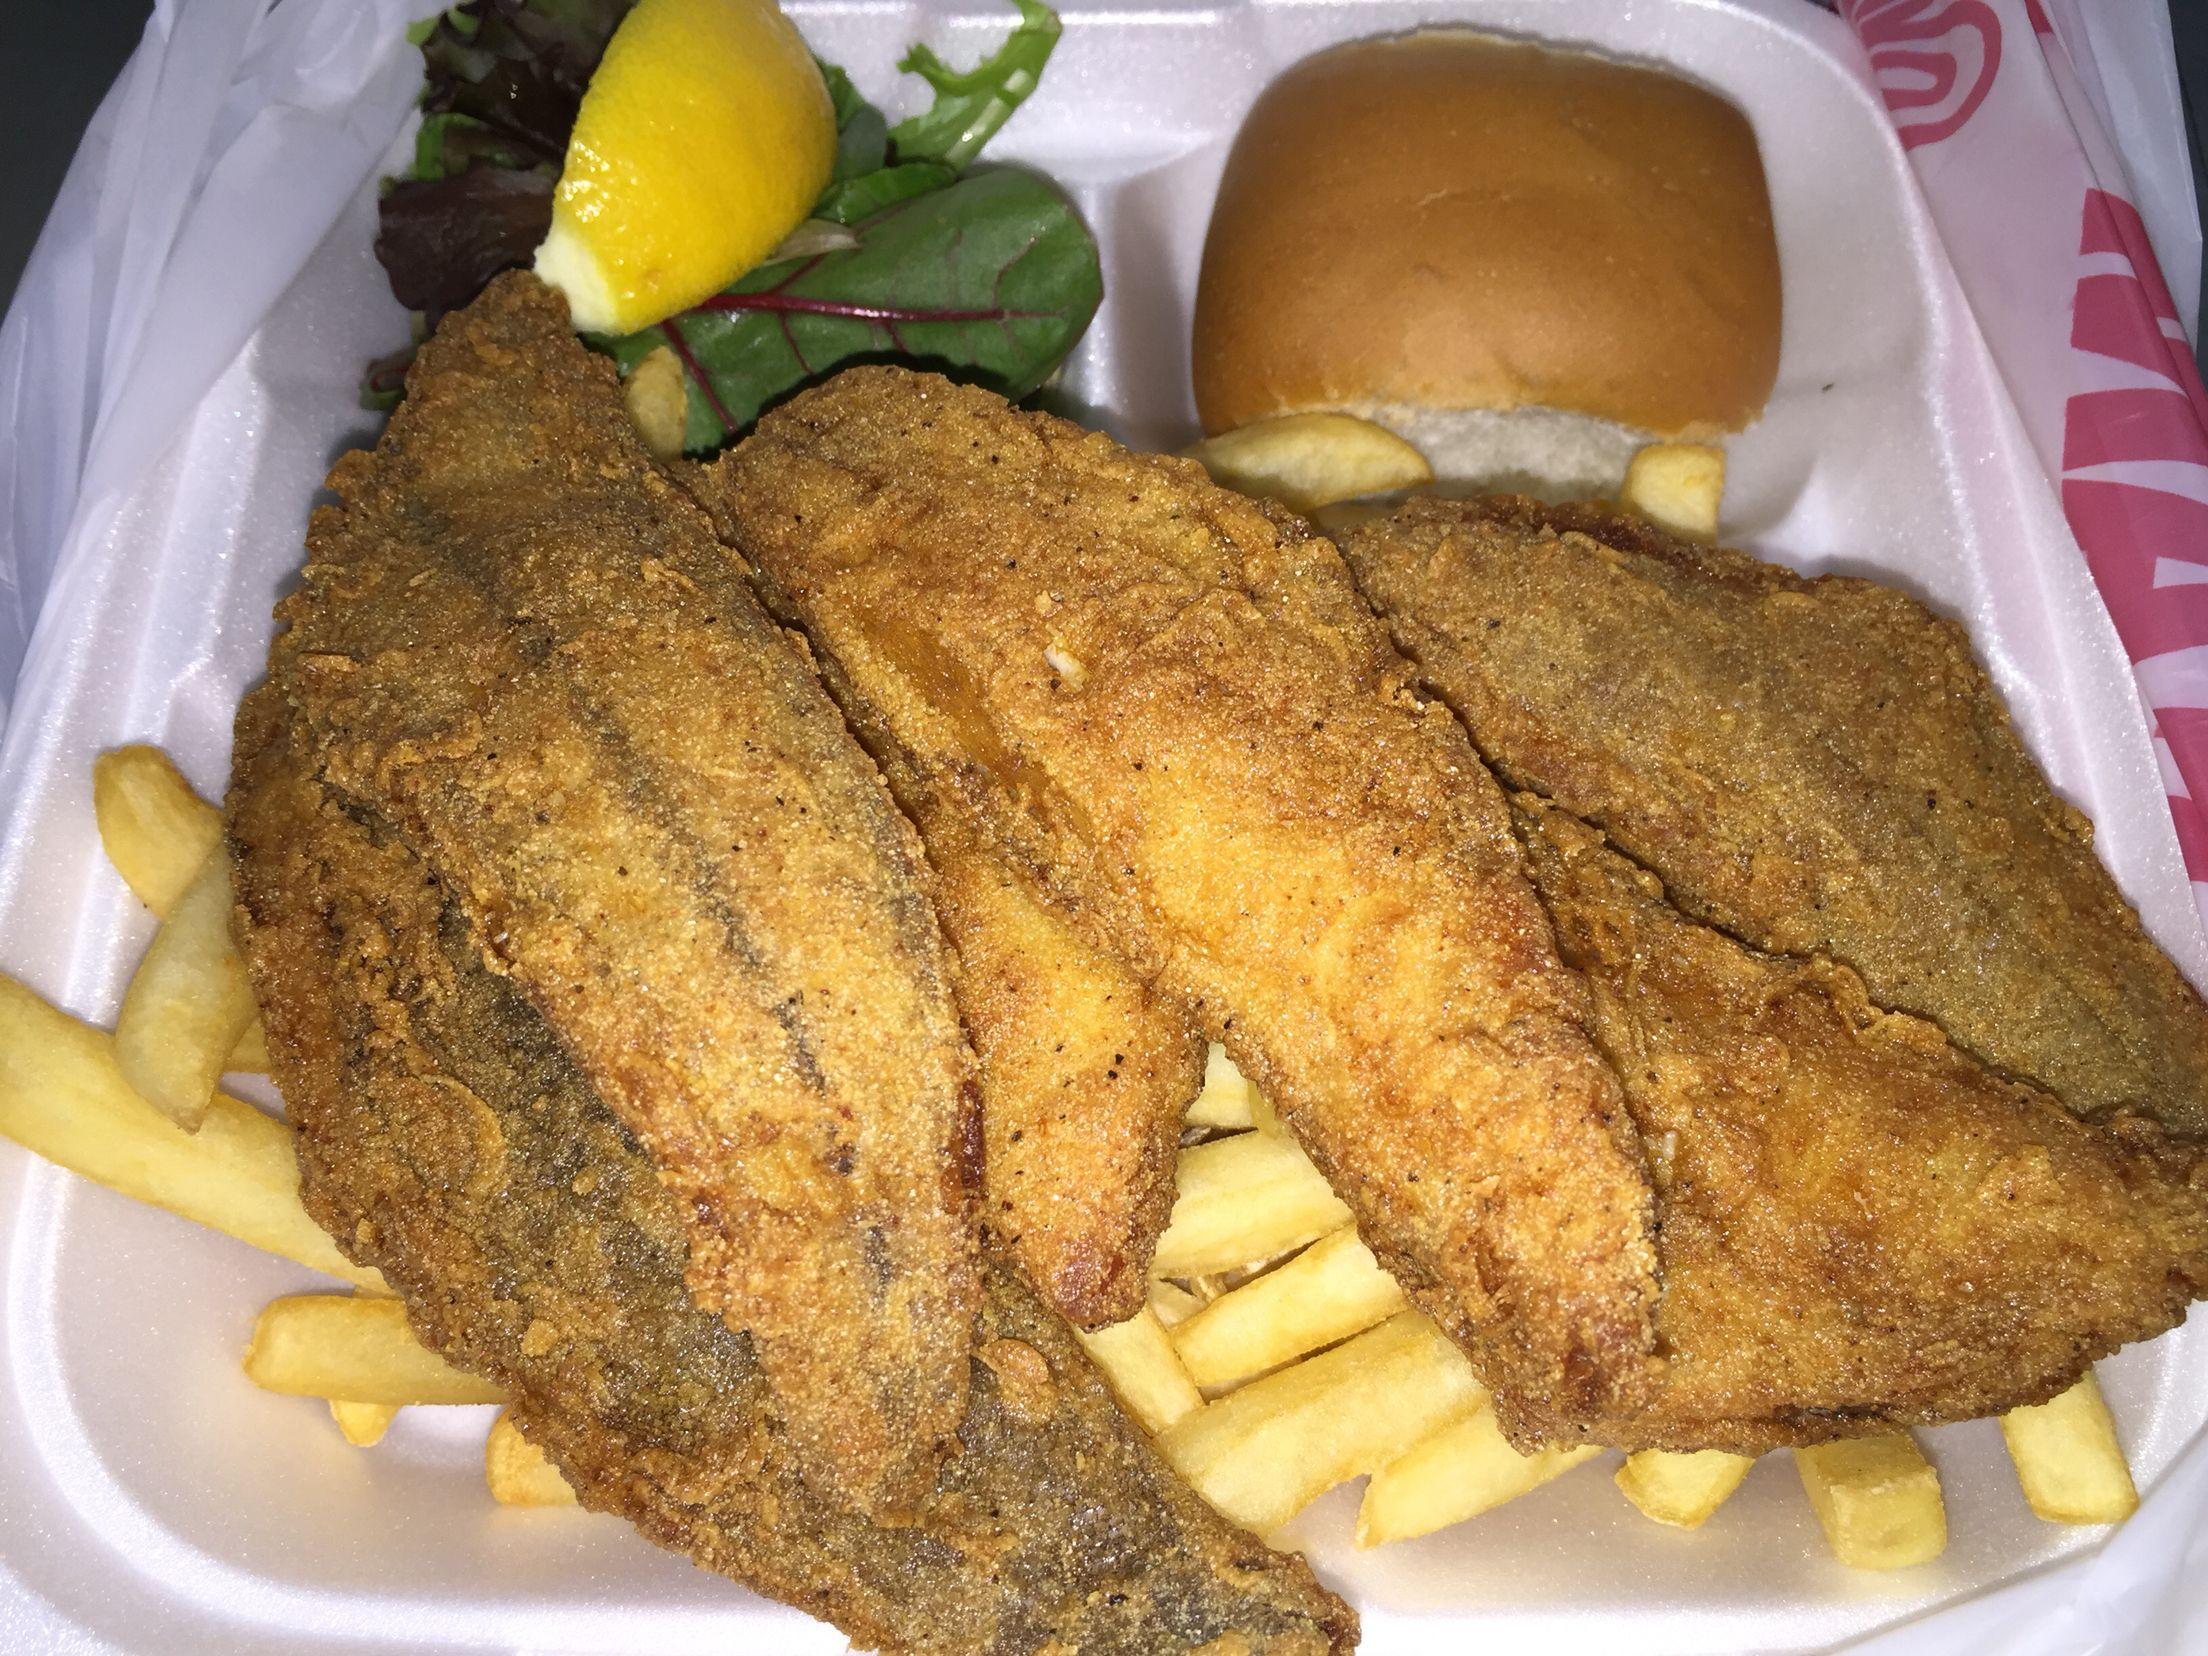 Charlie S Fish And Chips L A Ca Sand Dab Fish Food Fish And Chips Fish